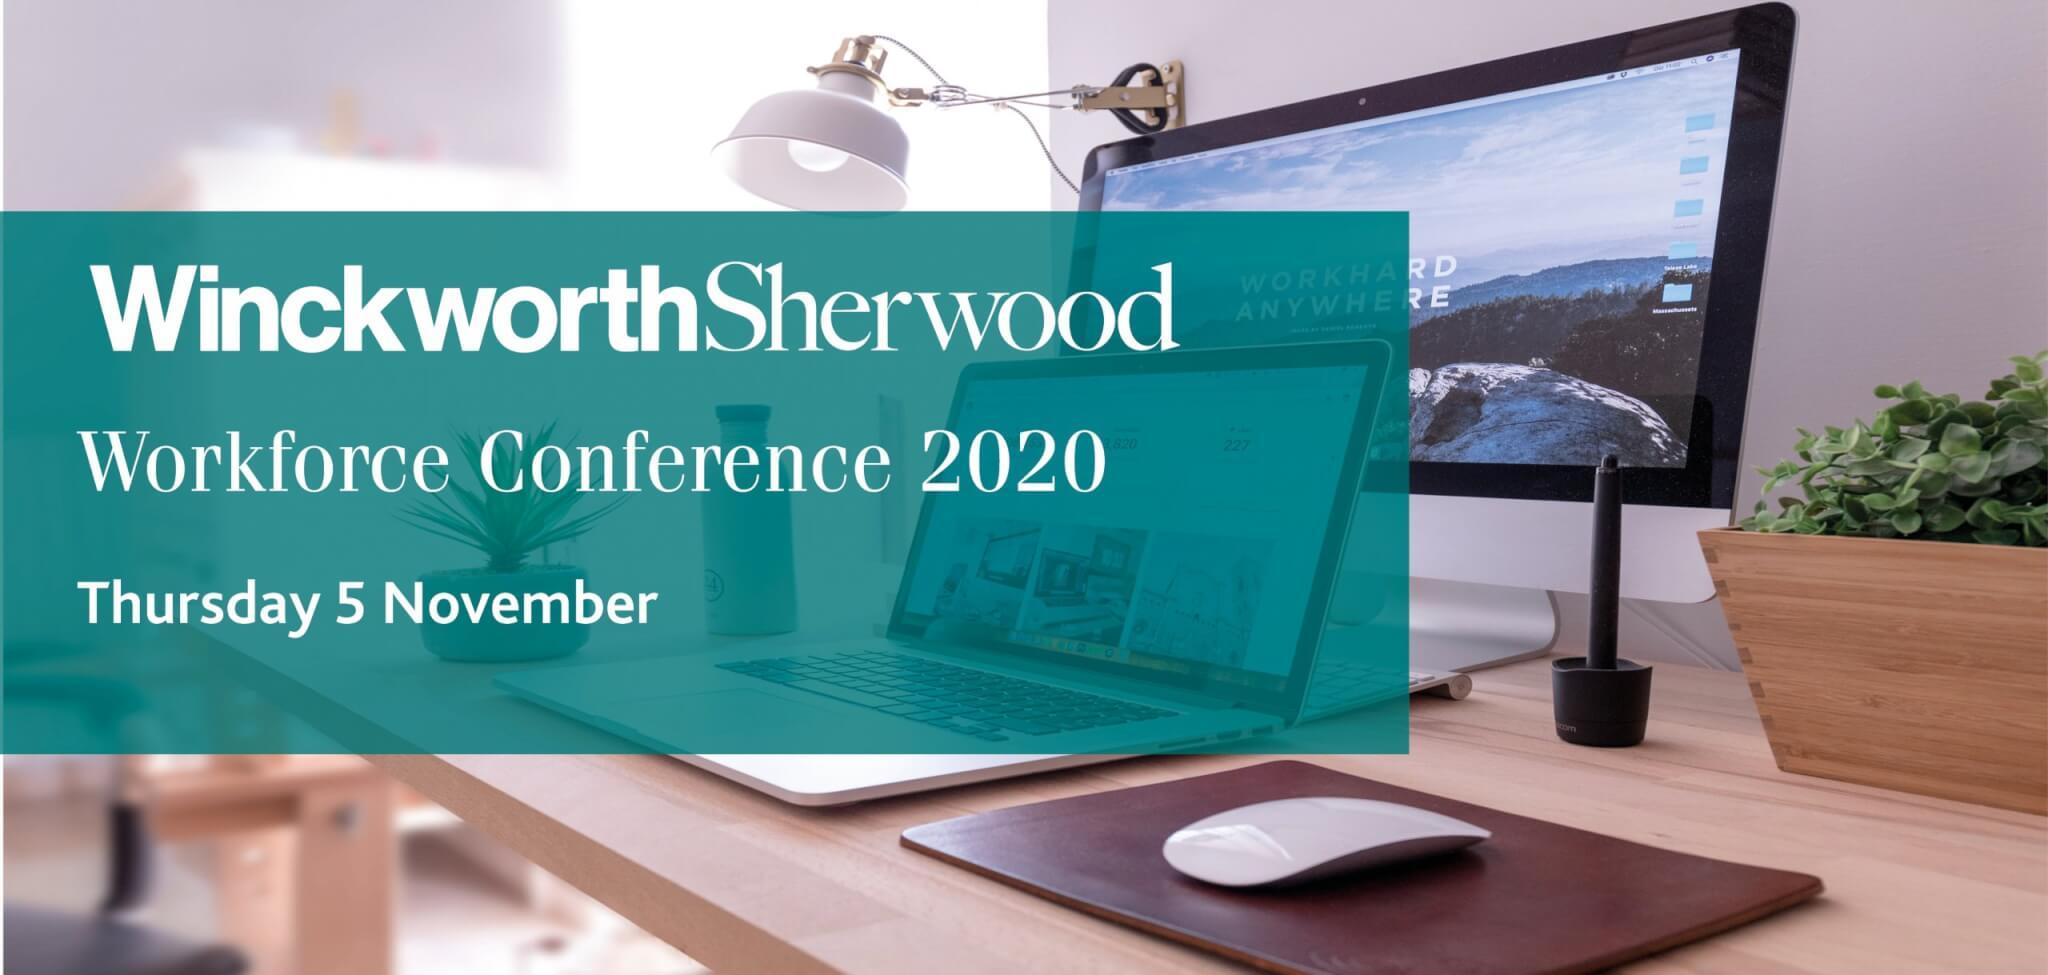 Workforce Conference Resource Hub